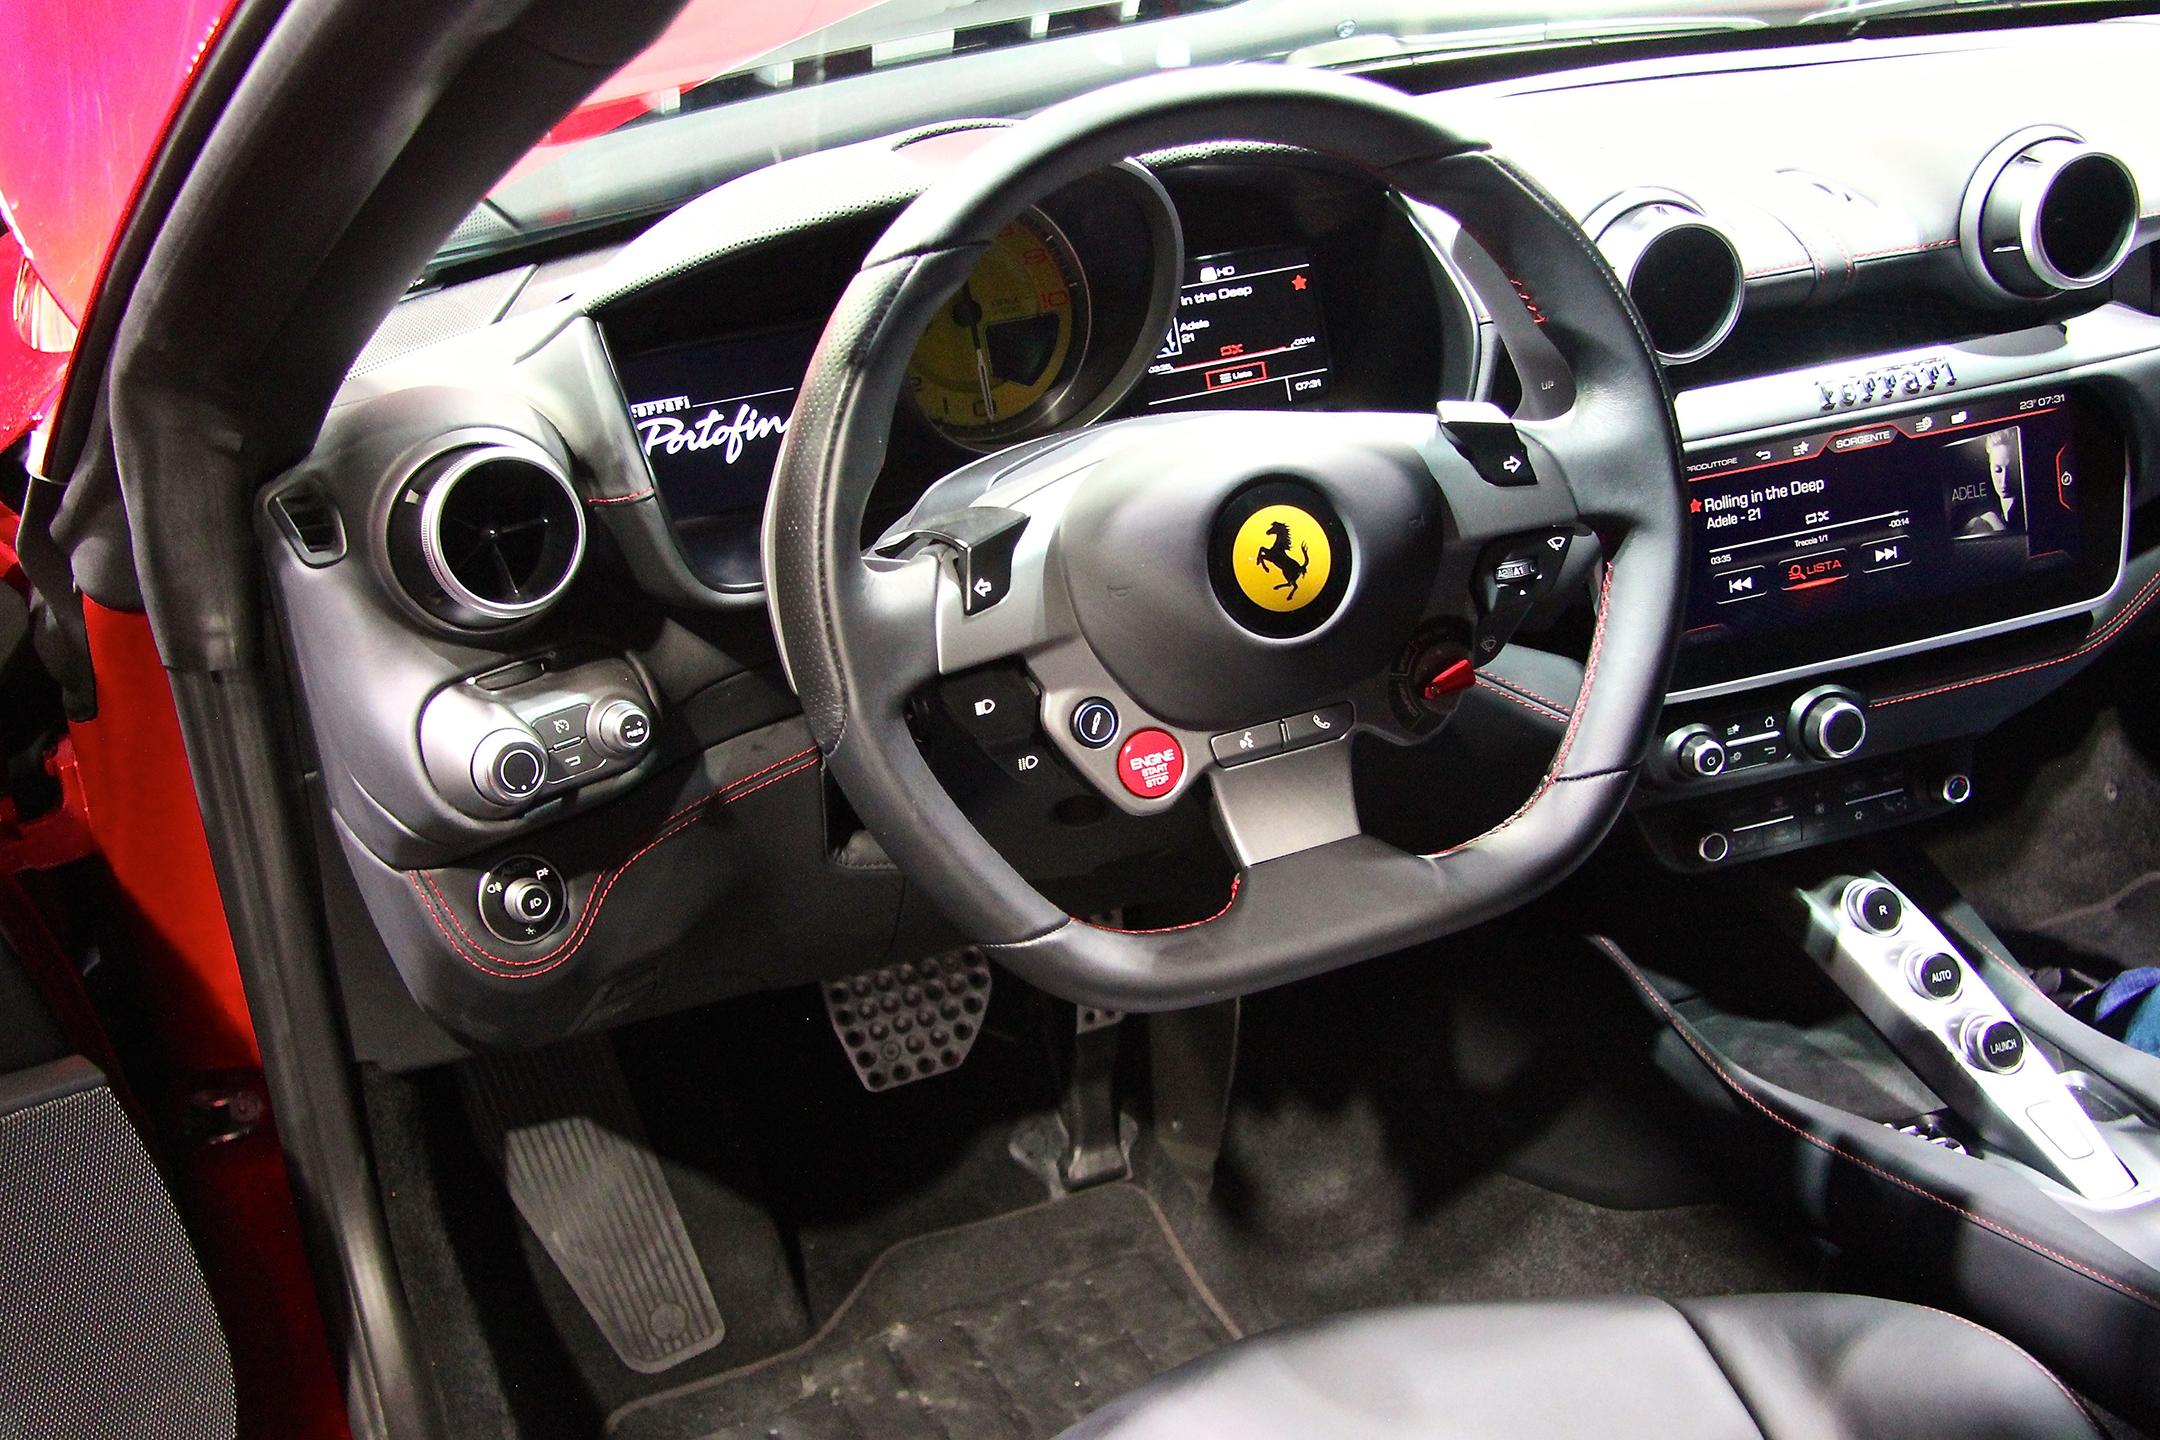 Ferrari Portofino - 2017 - interior / intérieur - présentation Ferrari France - photo Ludo Ferrari